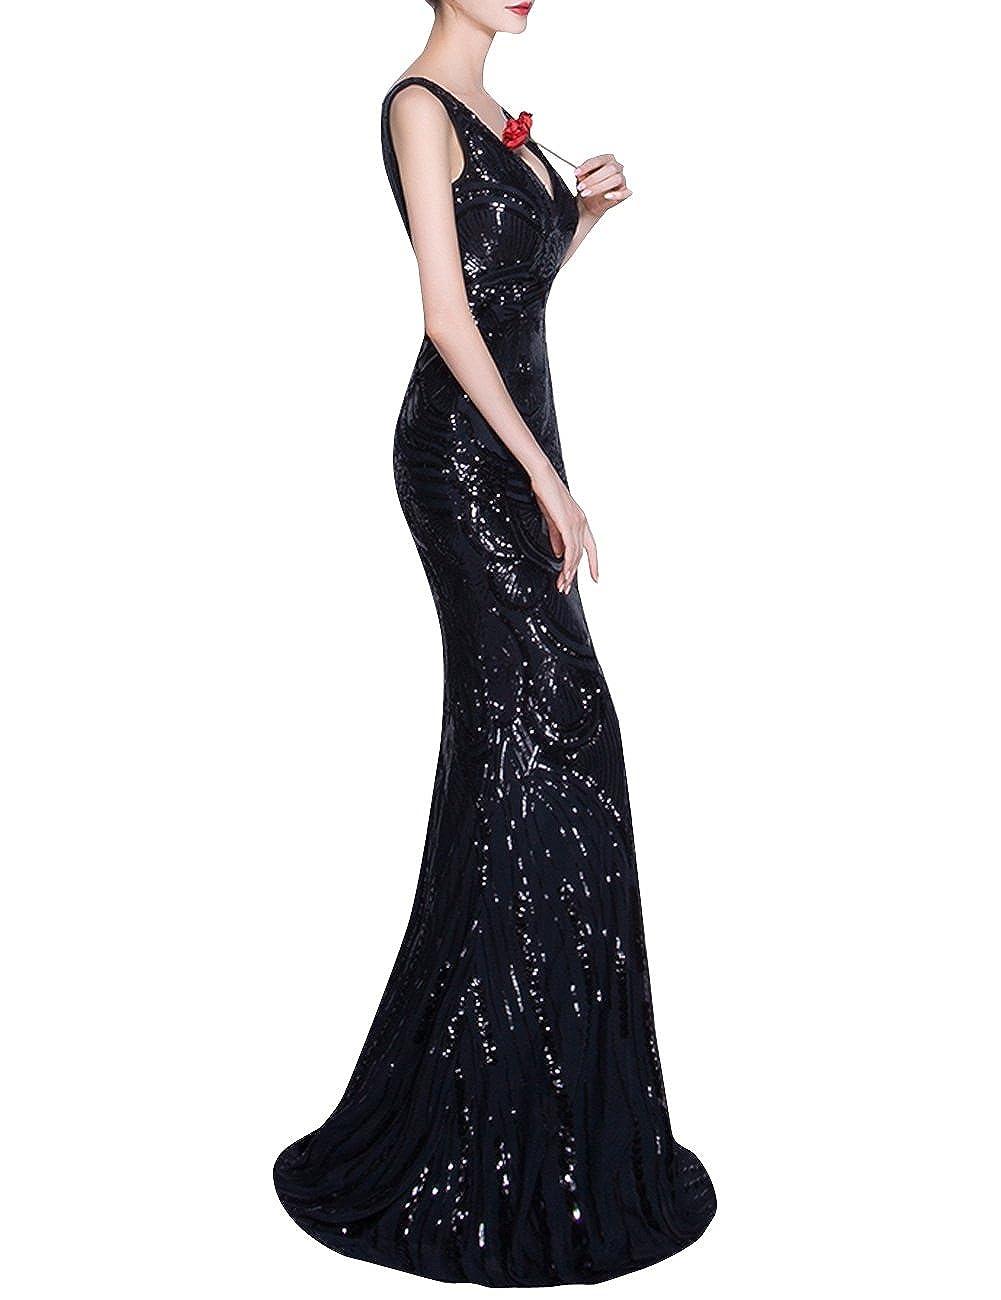 Dora Bridal Womens V-Neck Luxury Sequins Black Mermaid Formal Evening Dresses